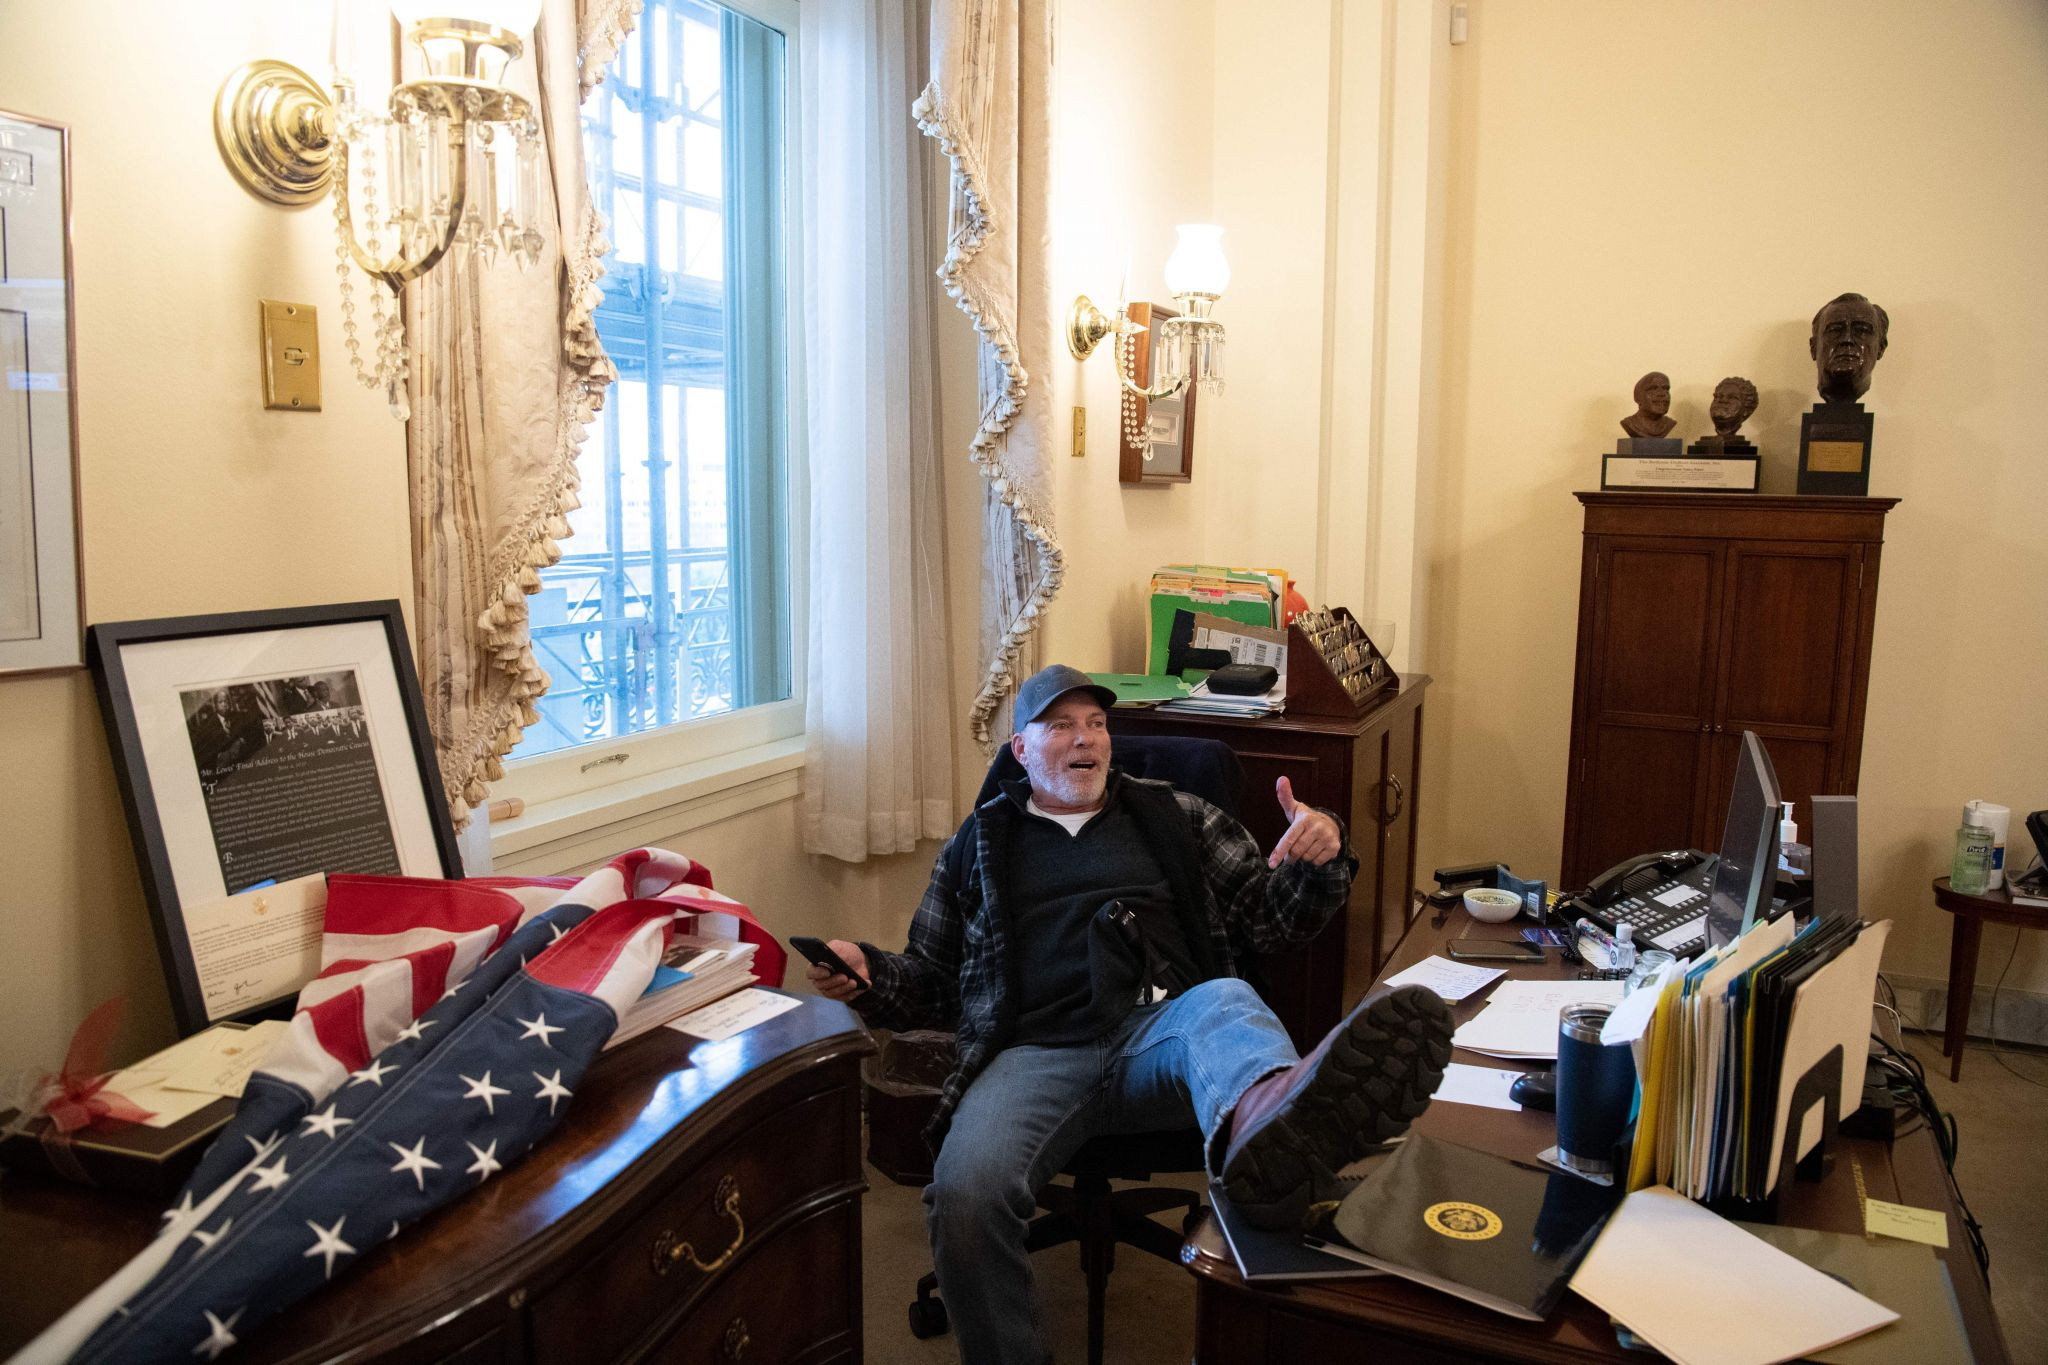 Prosecutors fed up with man who put feet on Pelosi's desk